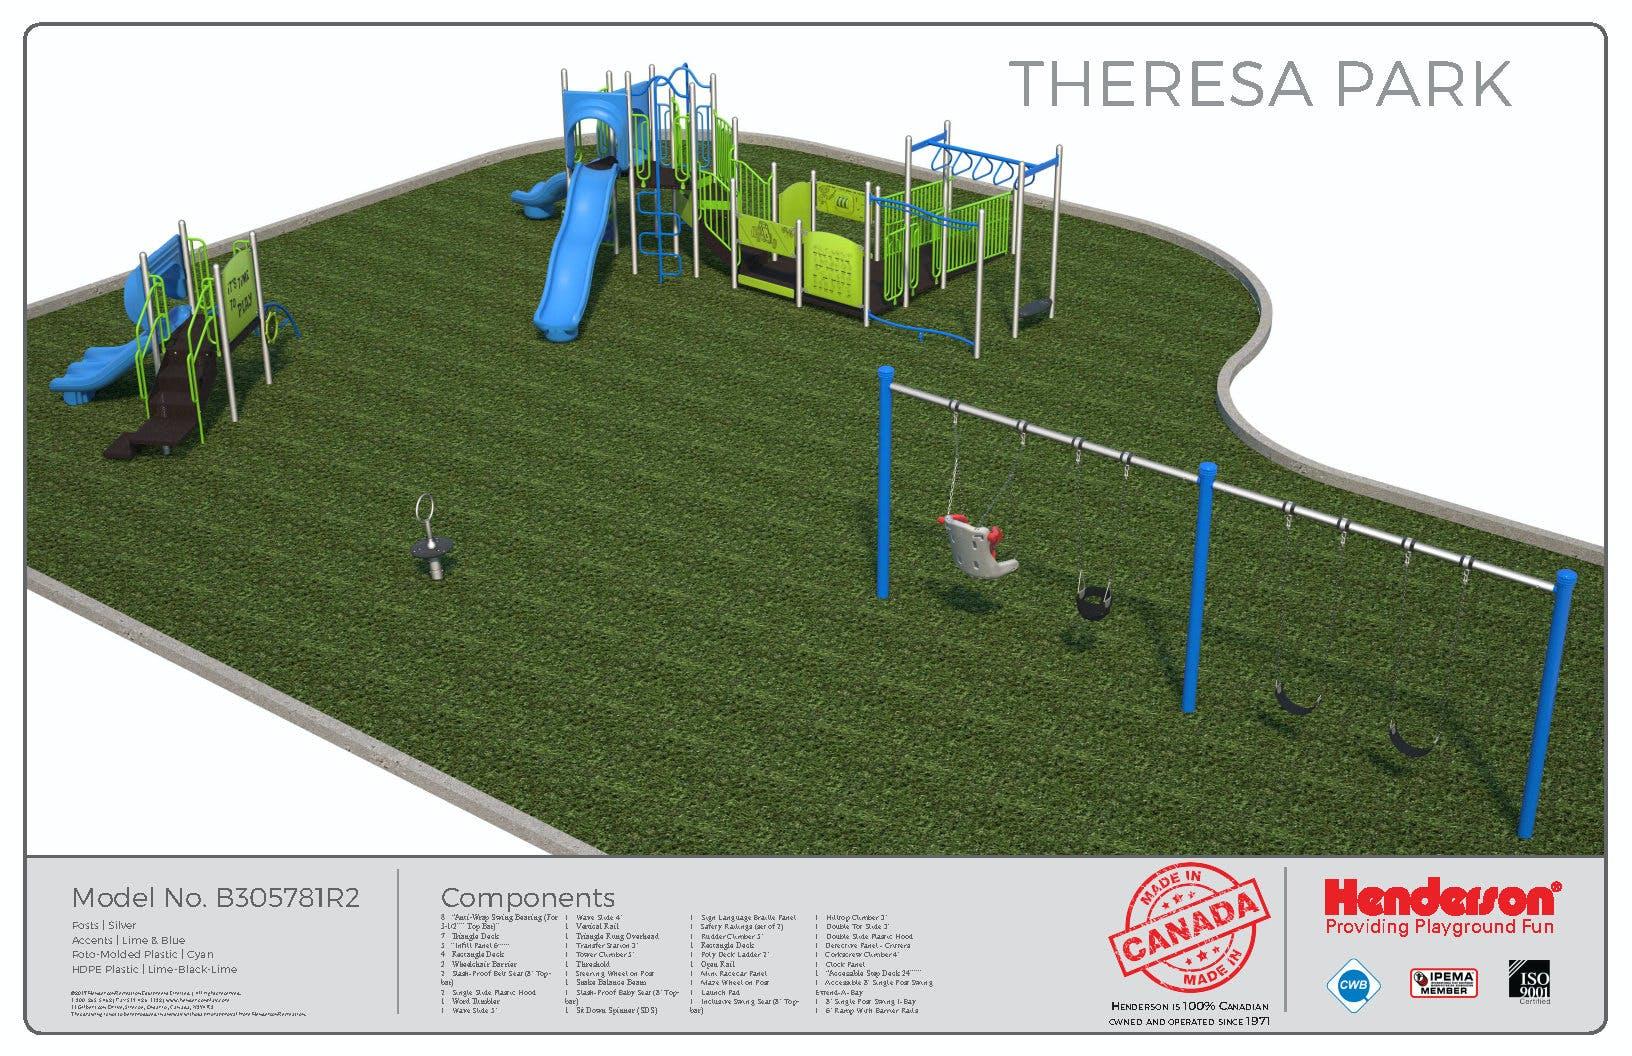 Theresa Park Playground Rendering